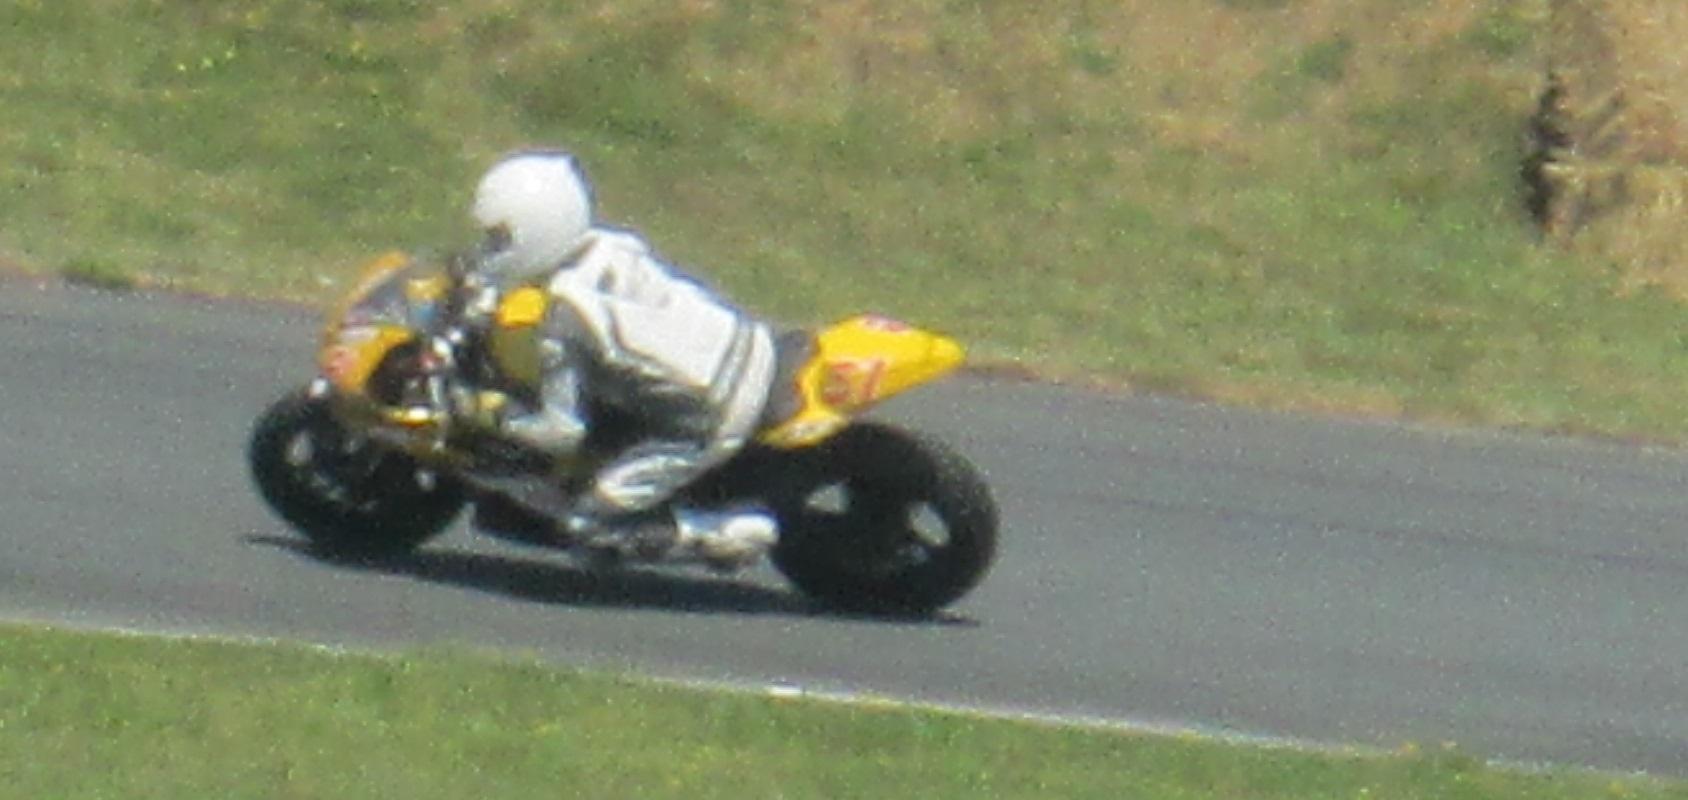 Superbikes 2014 picture number 49